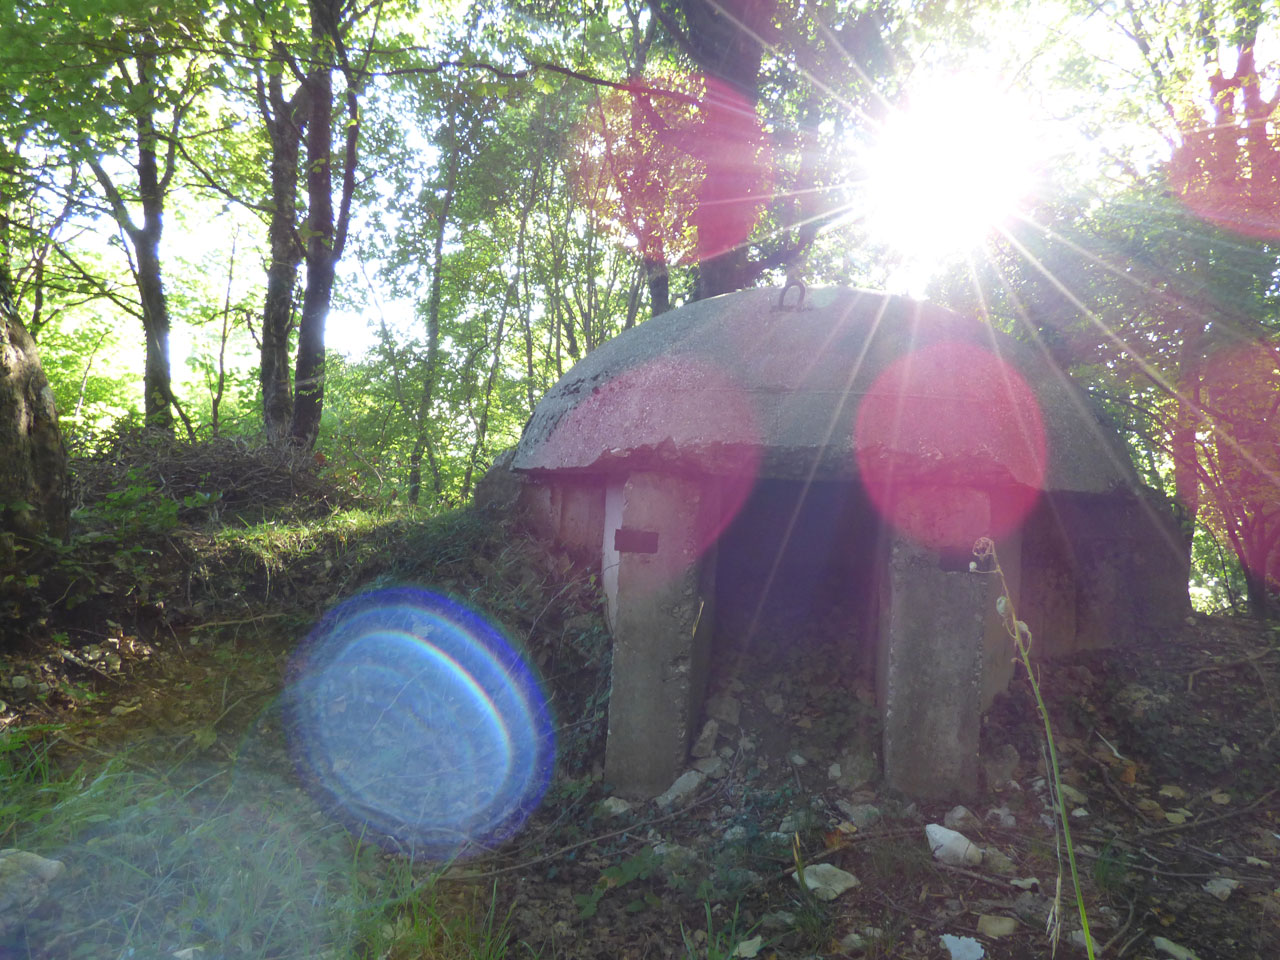 One of Hoxha's bunkers on Mount Dajti, Tirana, Albania